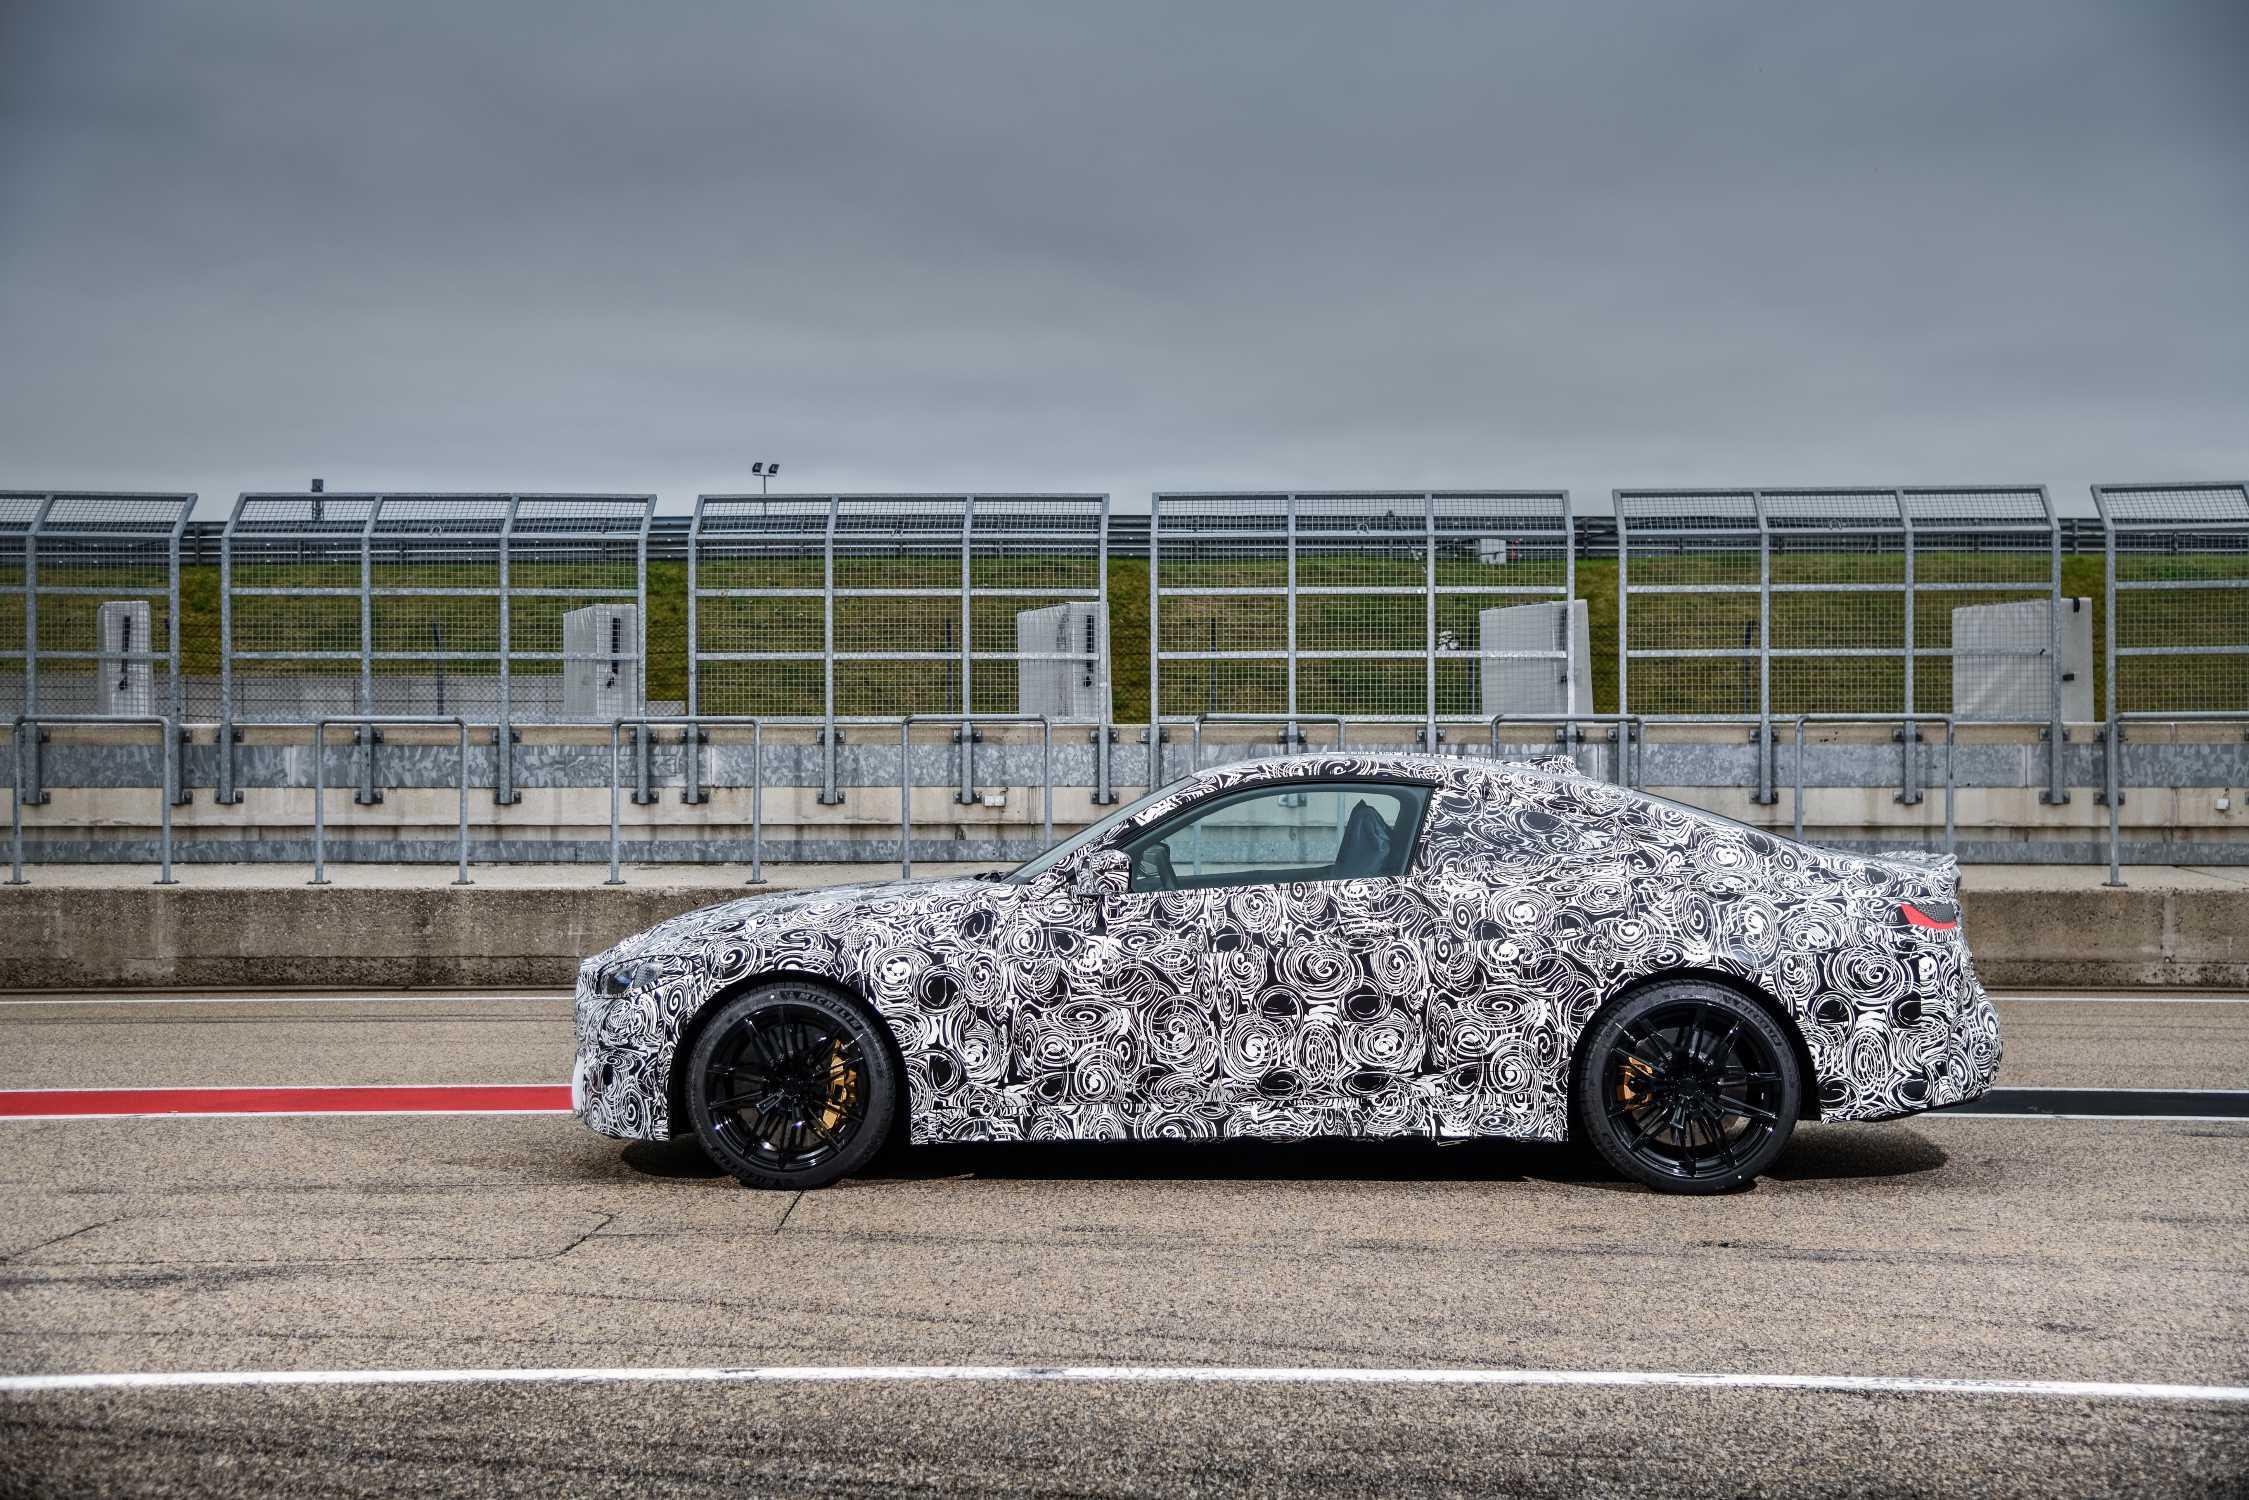 The new BMW M4 Coupé (07/2020).